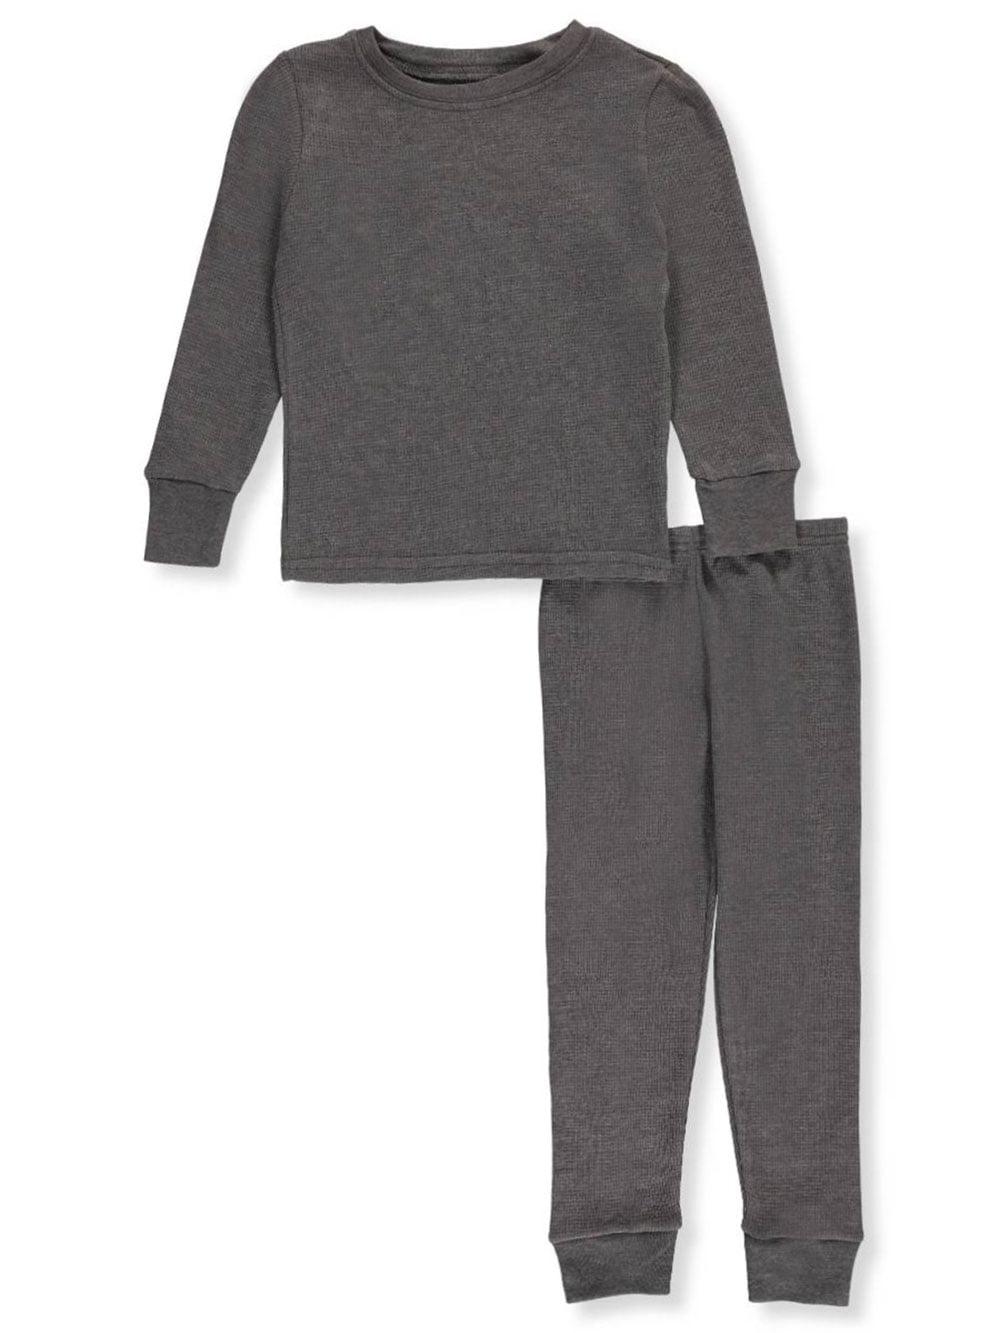 Ice2O Little Boys' 2-Piece Thermal Long Underwear Set (Sizes 4 - 7)